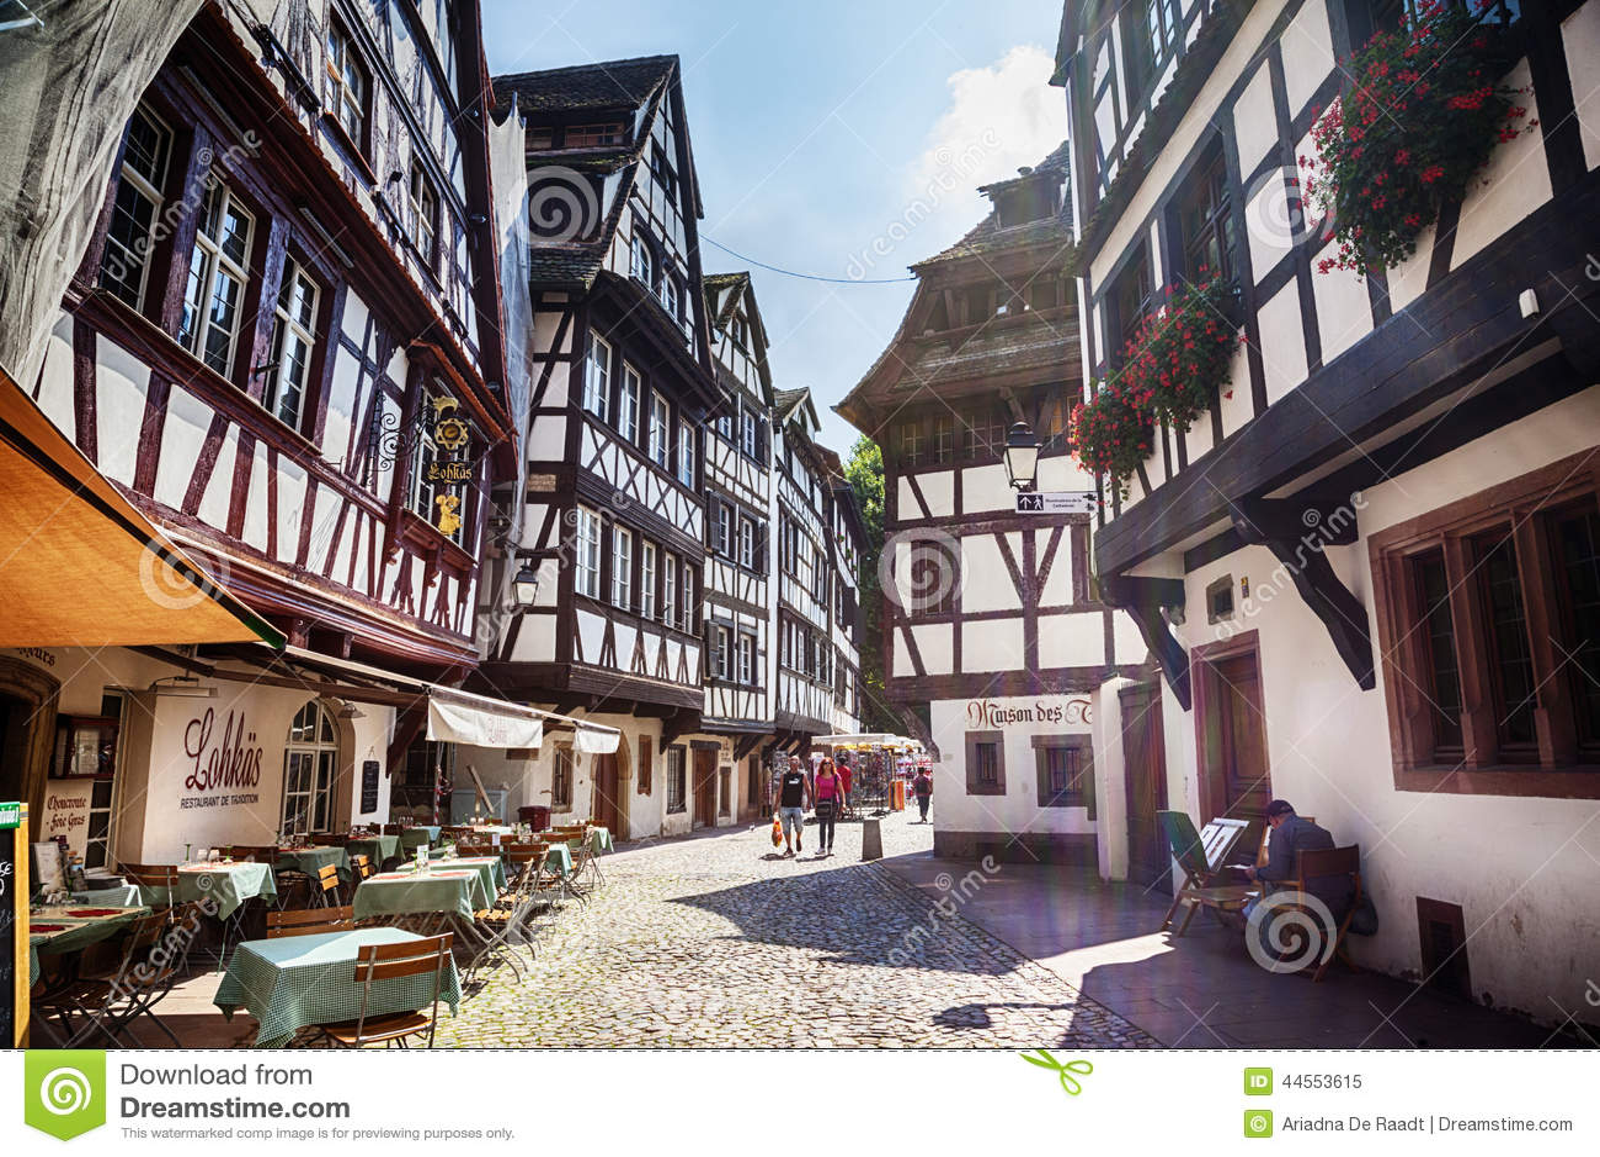 street of petit france part of old town strasbourg france editorial image image of. Black Bedroom Furniture Sets. Home Design Ideas